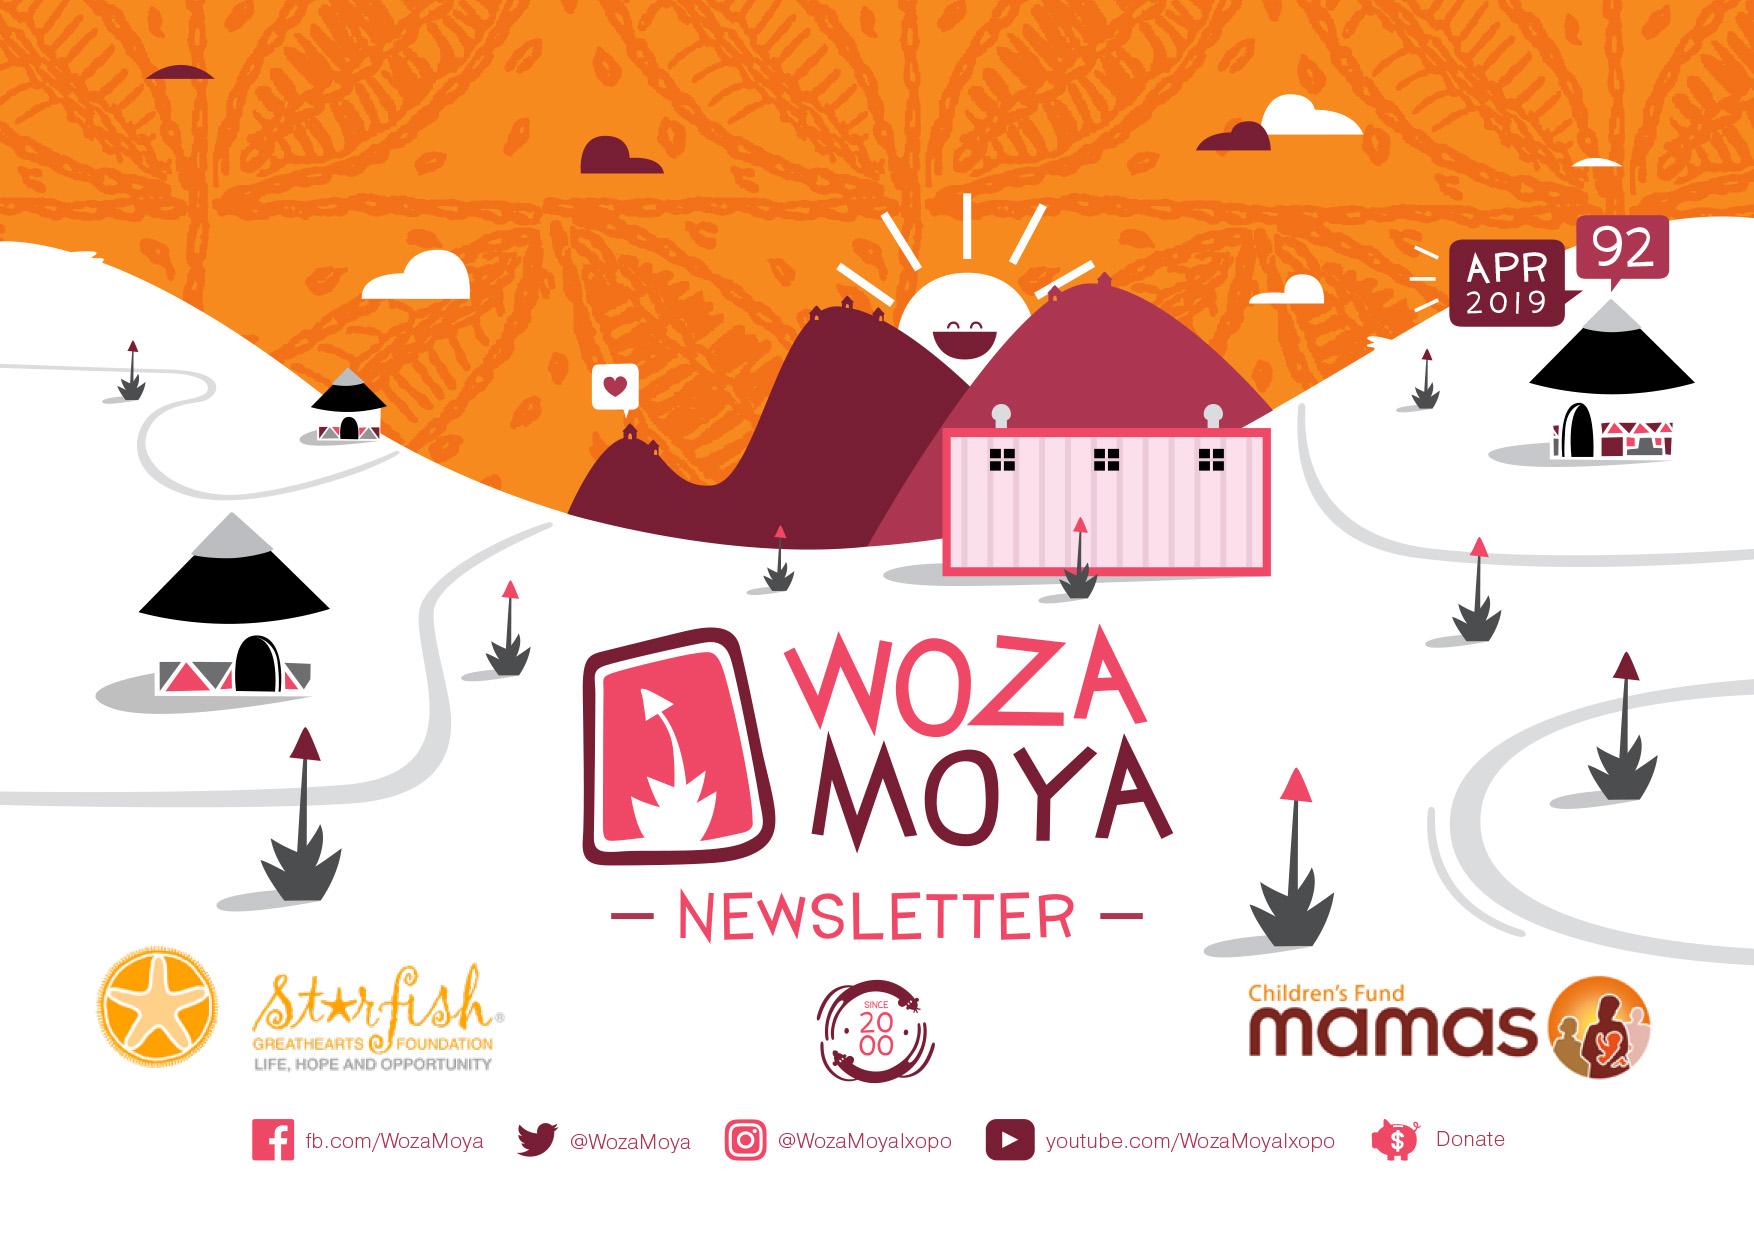 WozaMoya_Newsletter_92.jpg